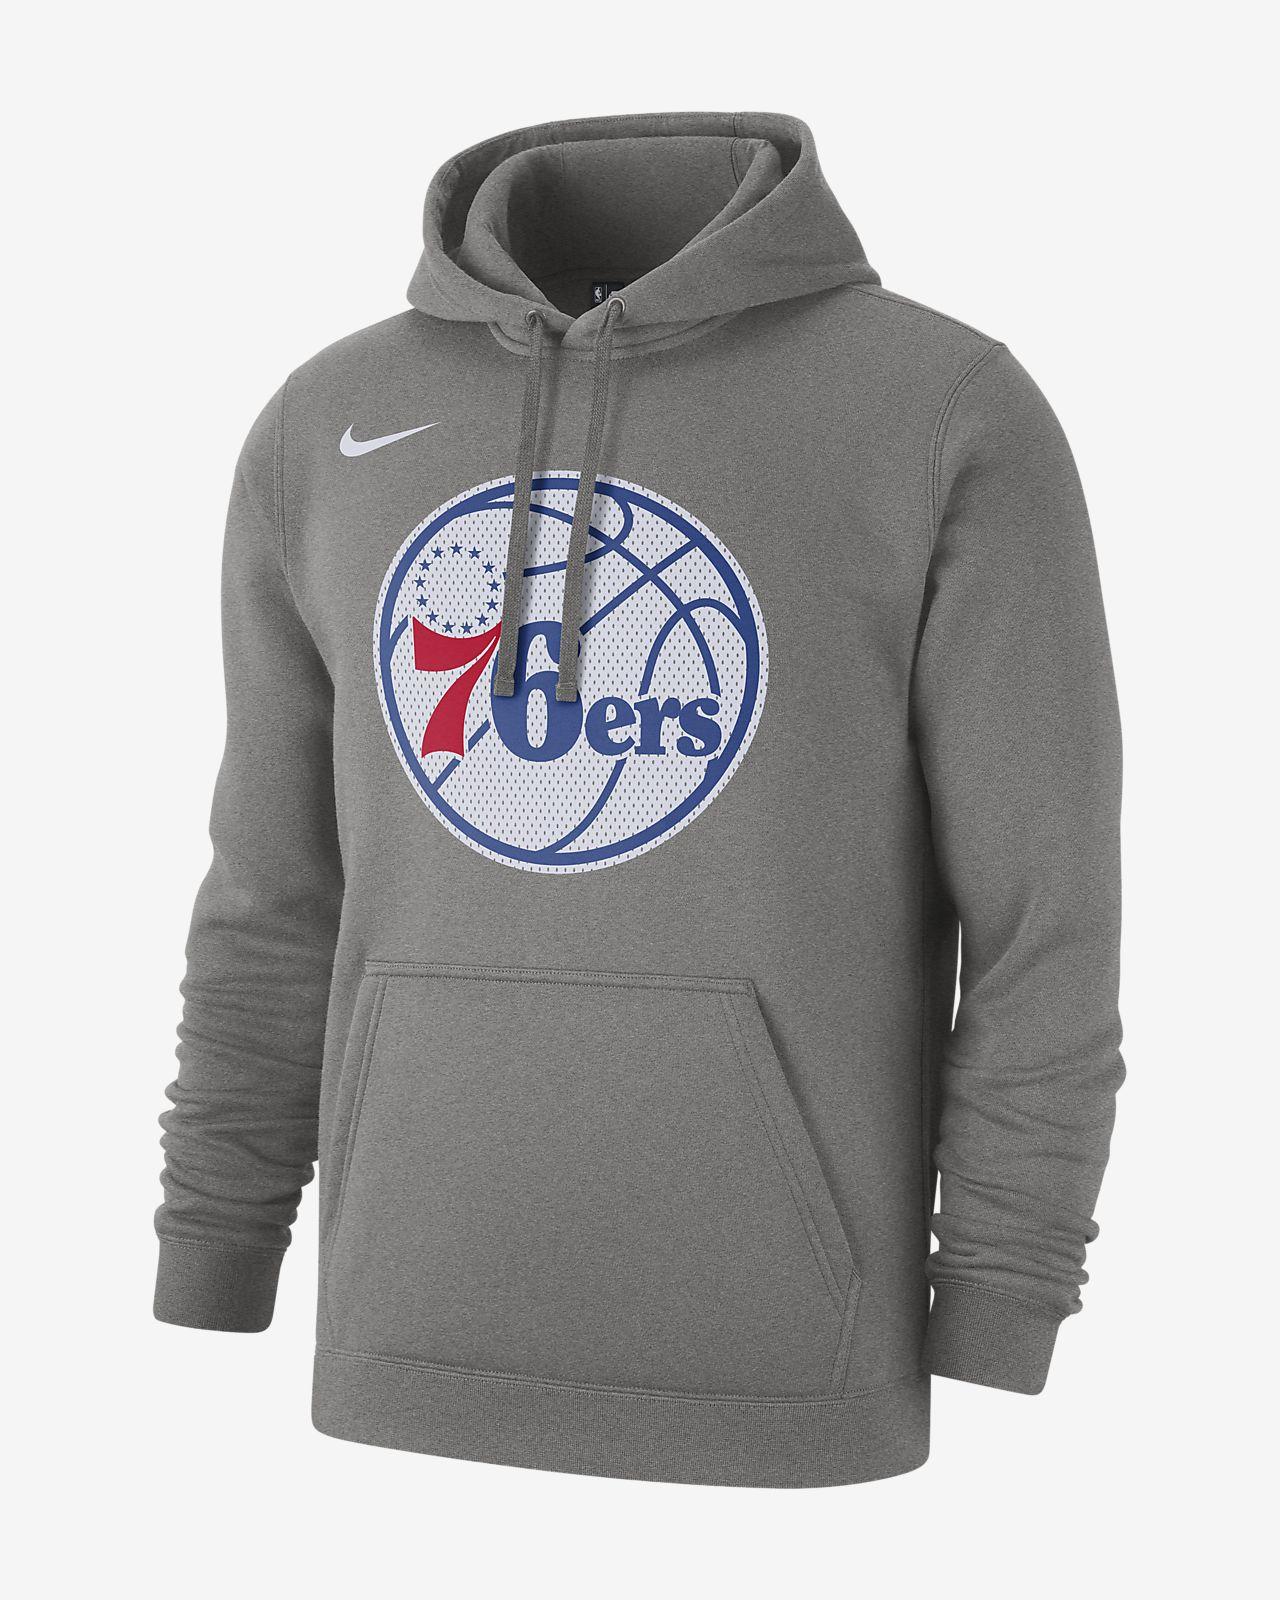 Sudadera con capucha de la NBA para hombre Philadelphia 76ers Nike